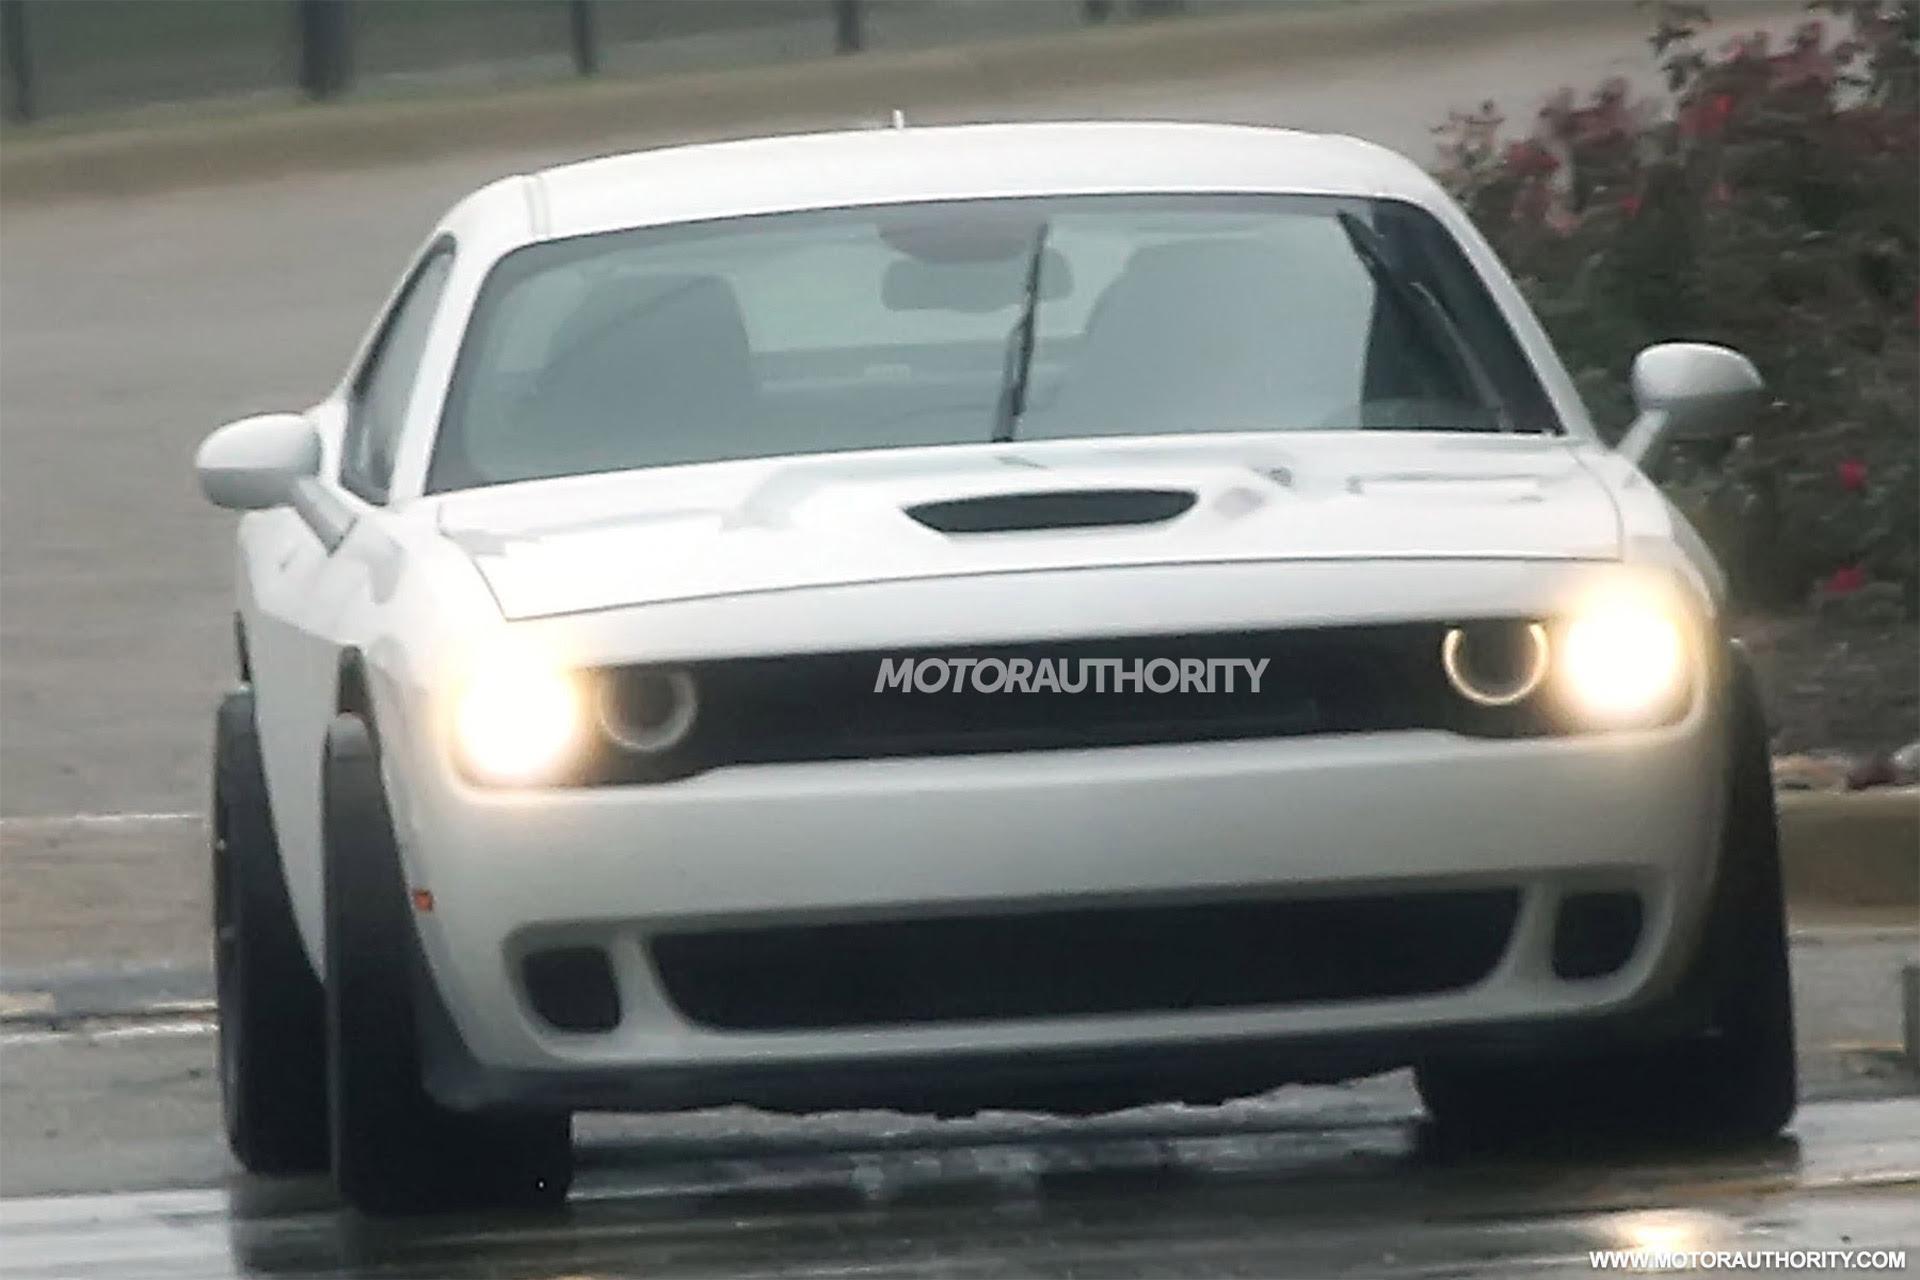 2018 Dodge Challenger ADR (wide-body SRT Hellcat) spy shots